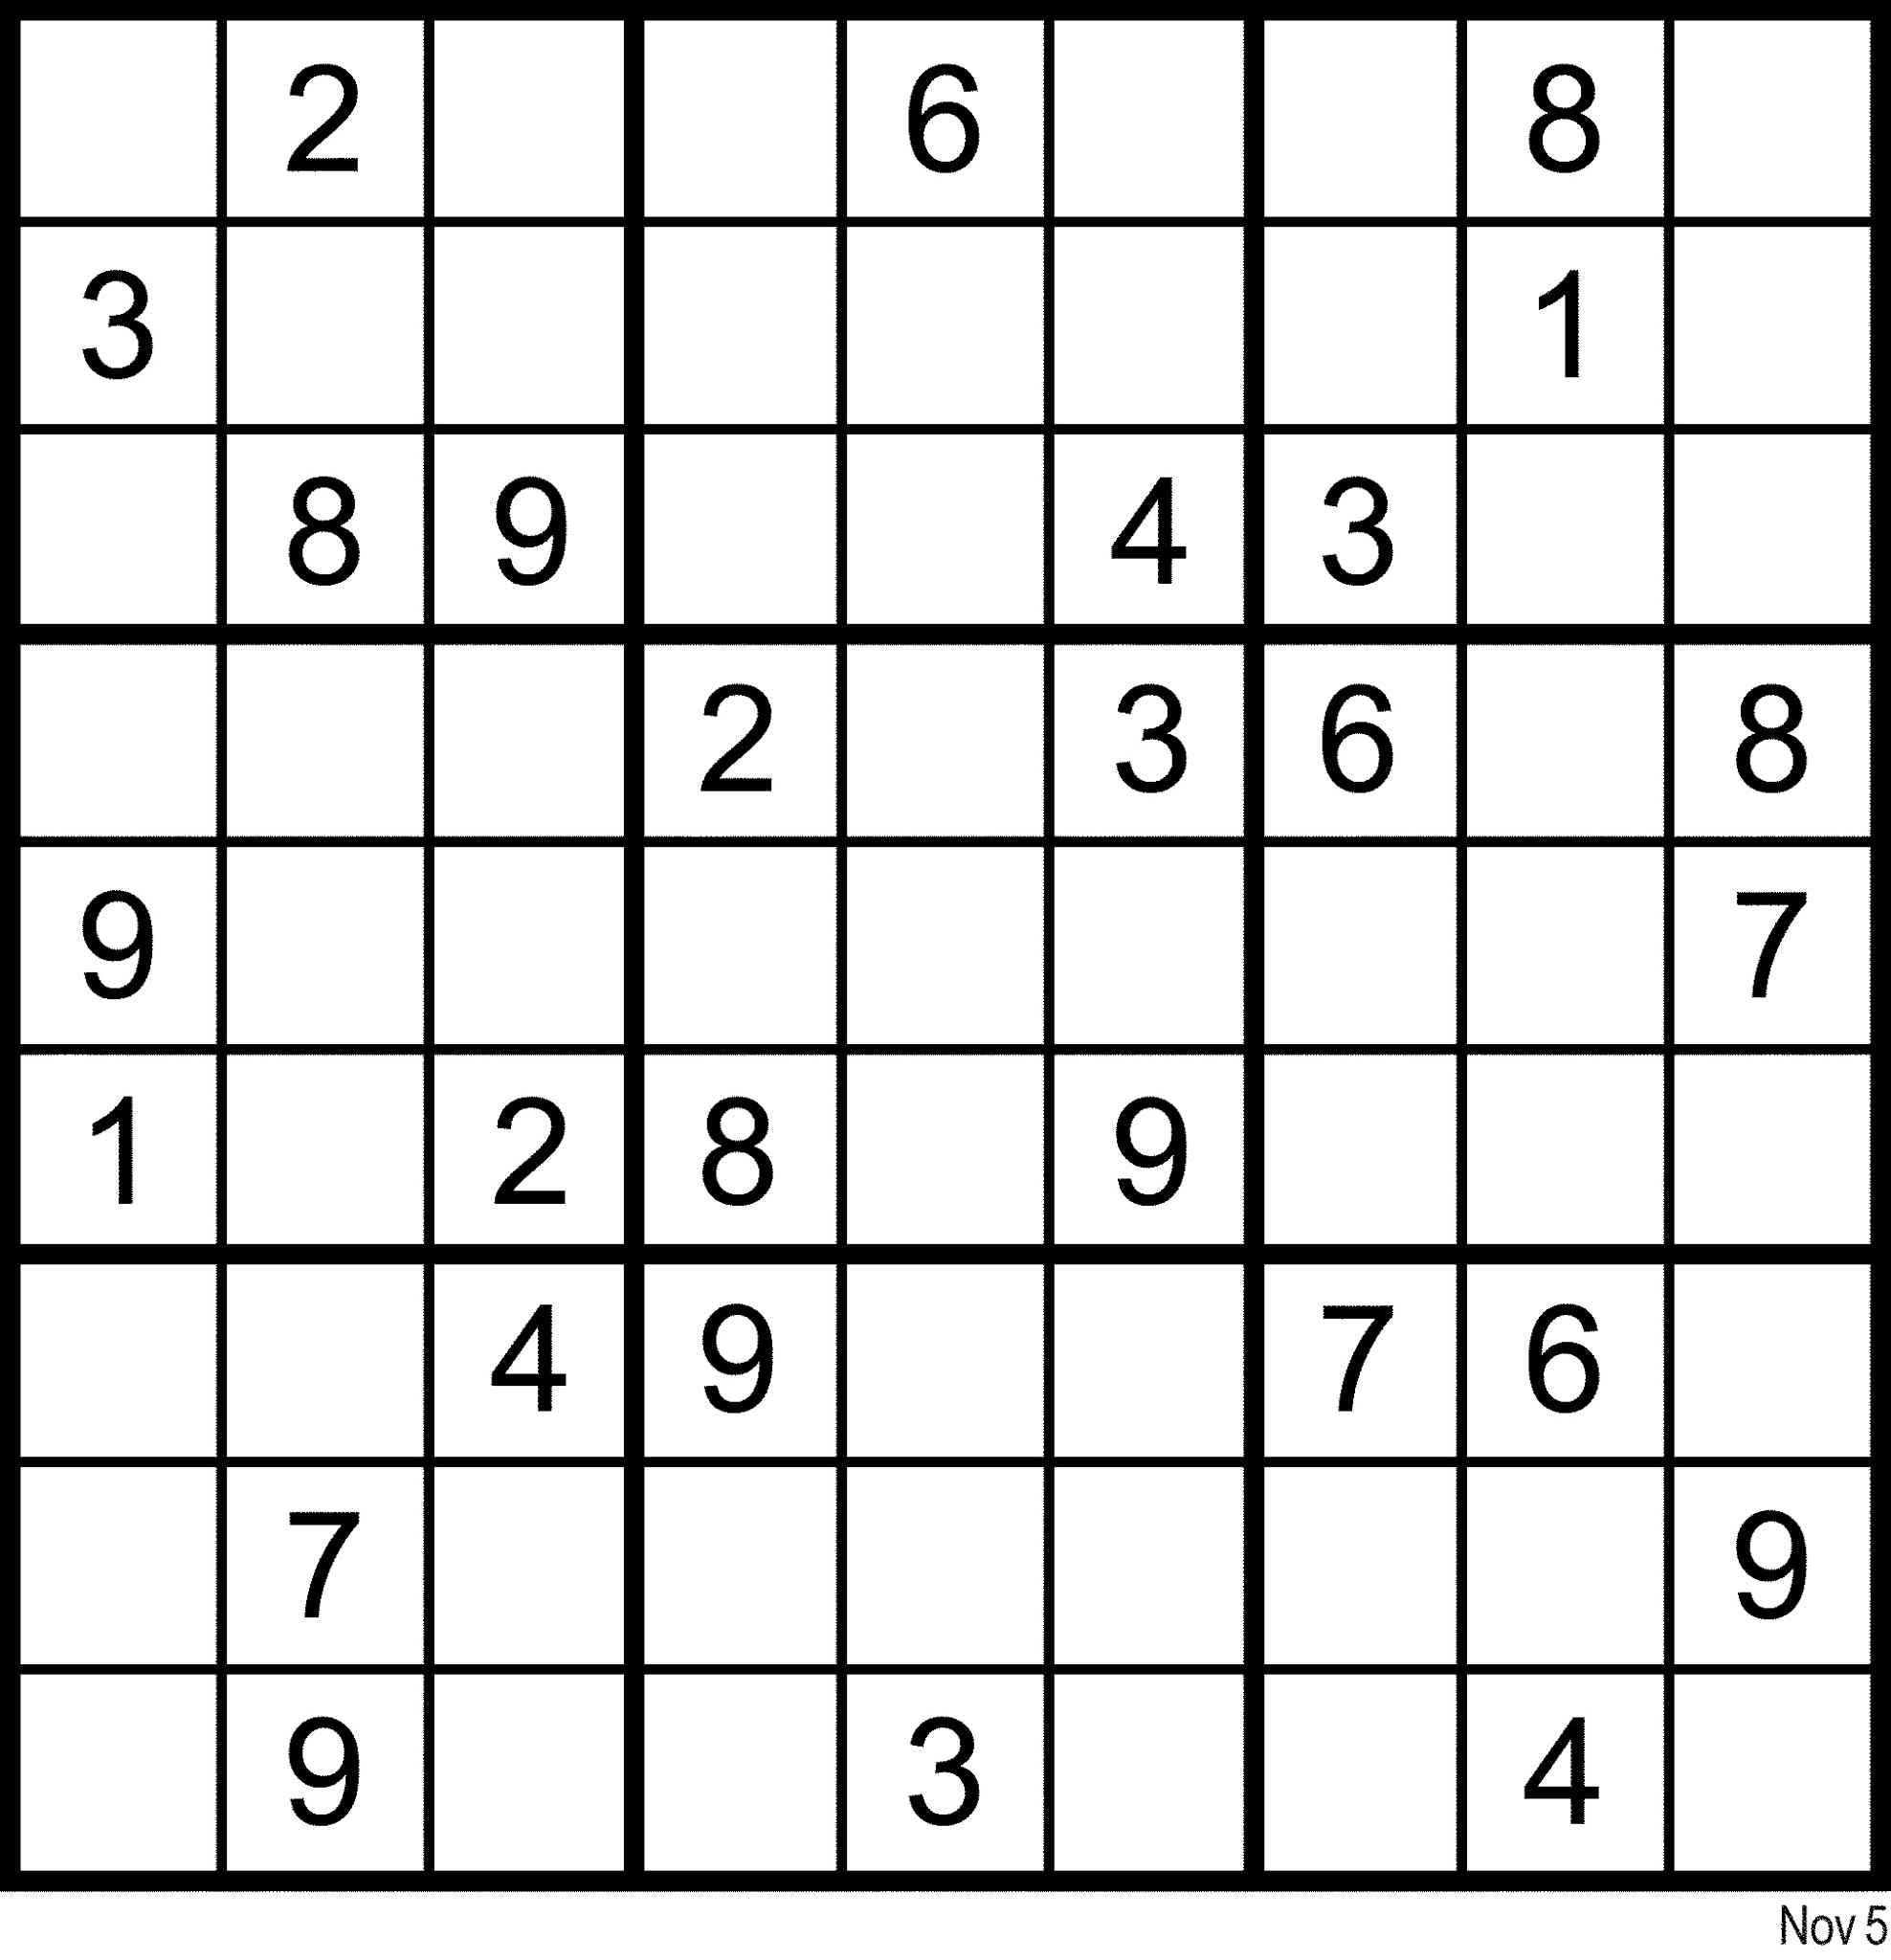 Sudoku En Ligne encequiconcerne Grille Sudoku Gratuite À Imprimer